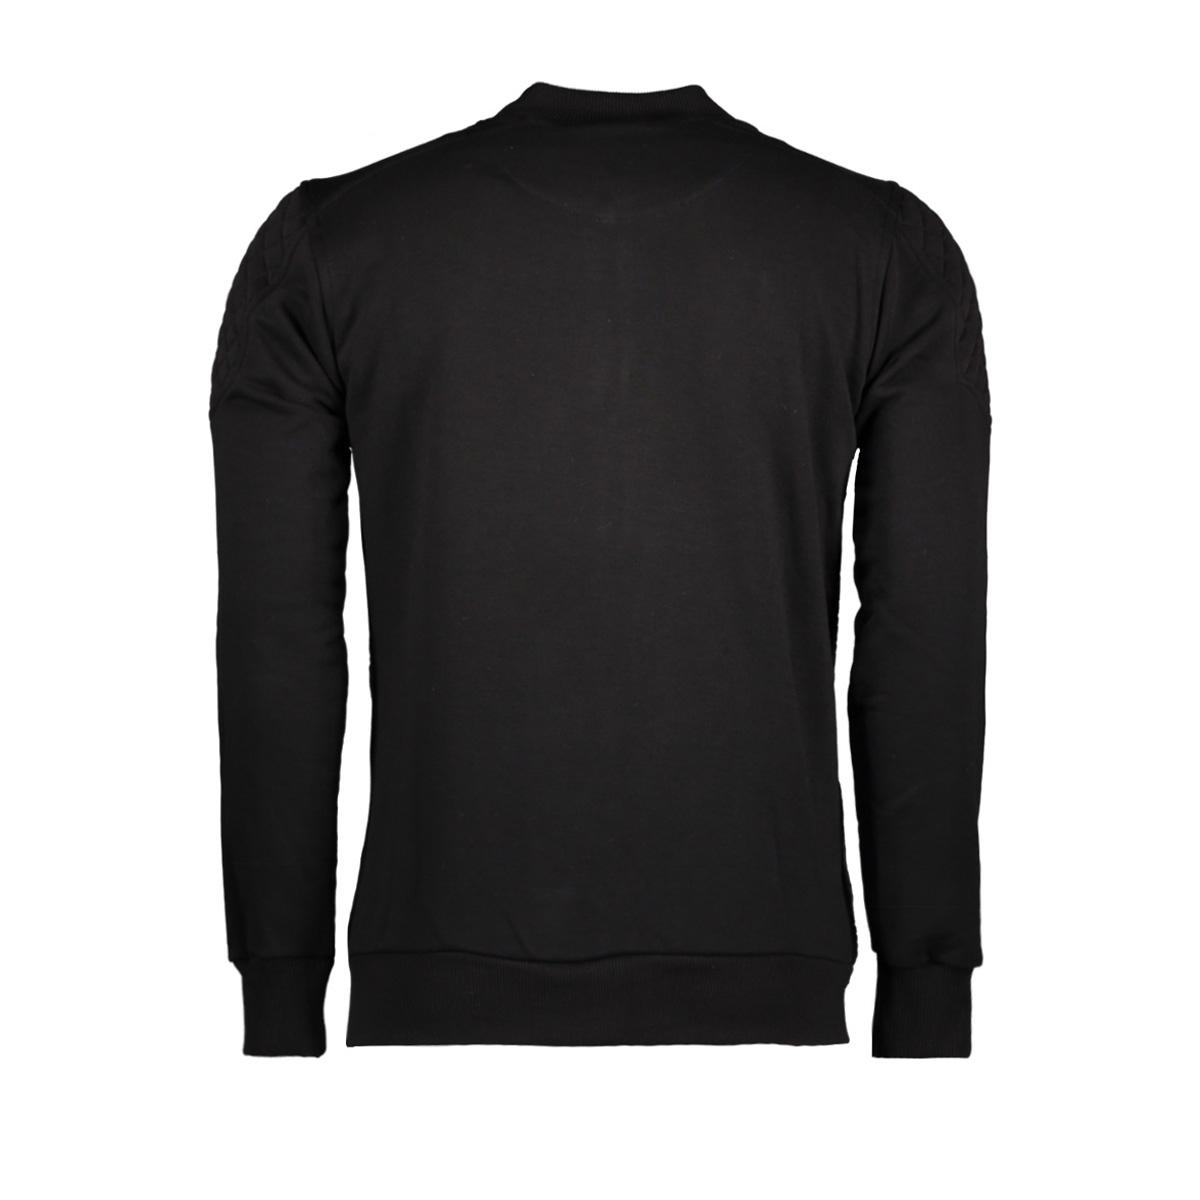 42101 gabbiano vest black